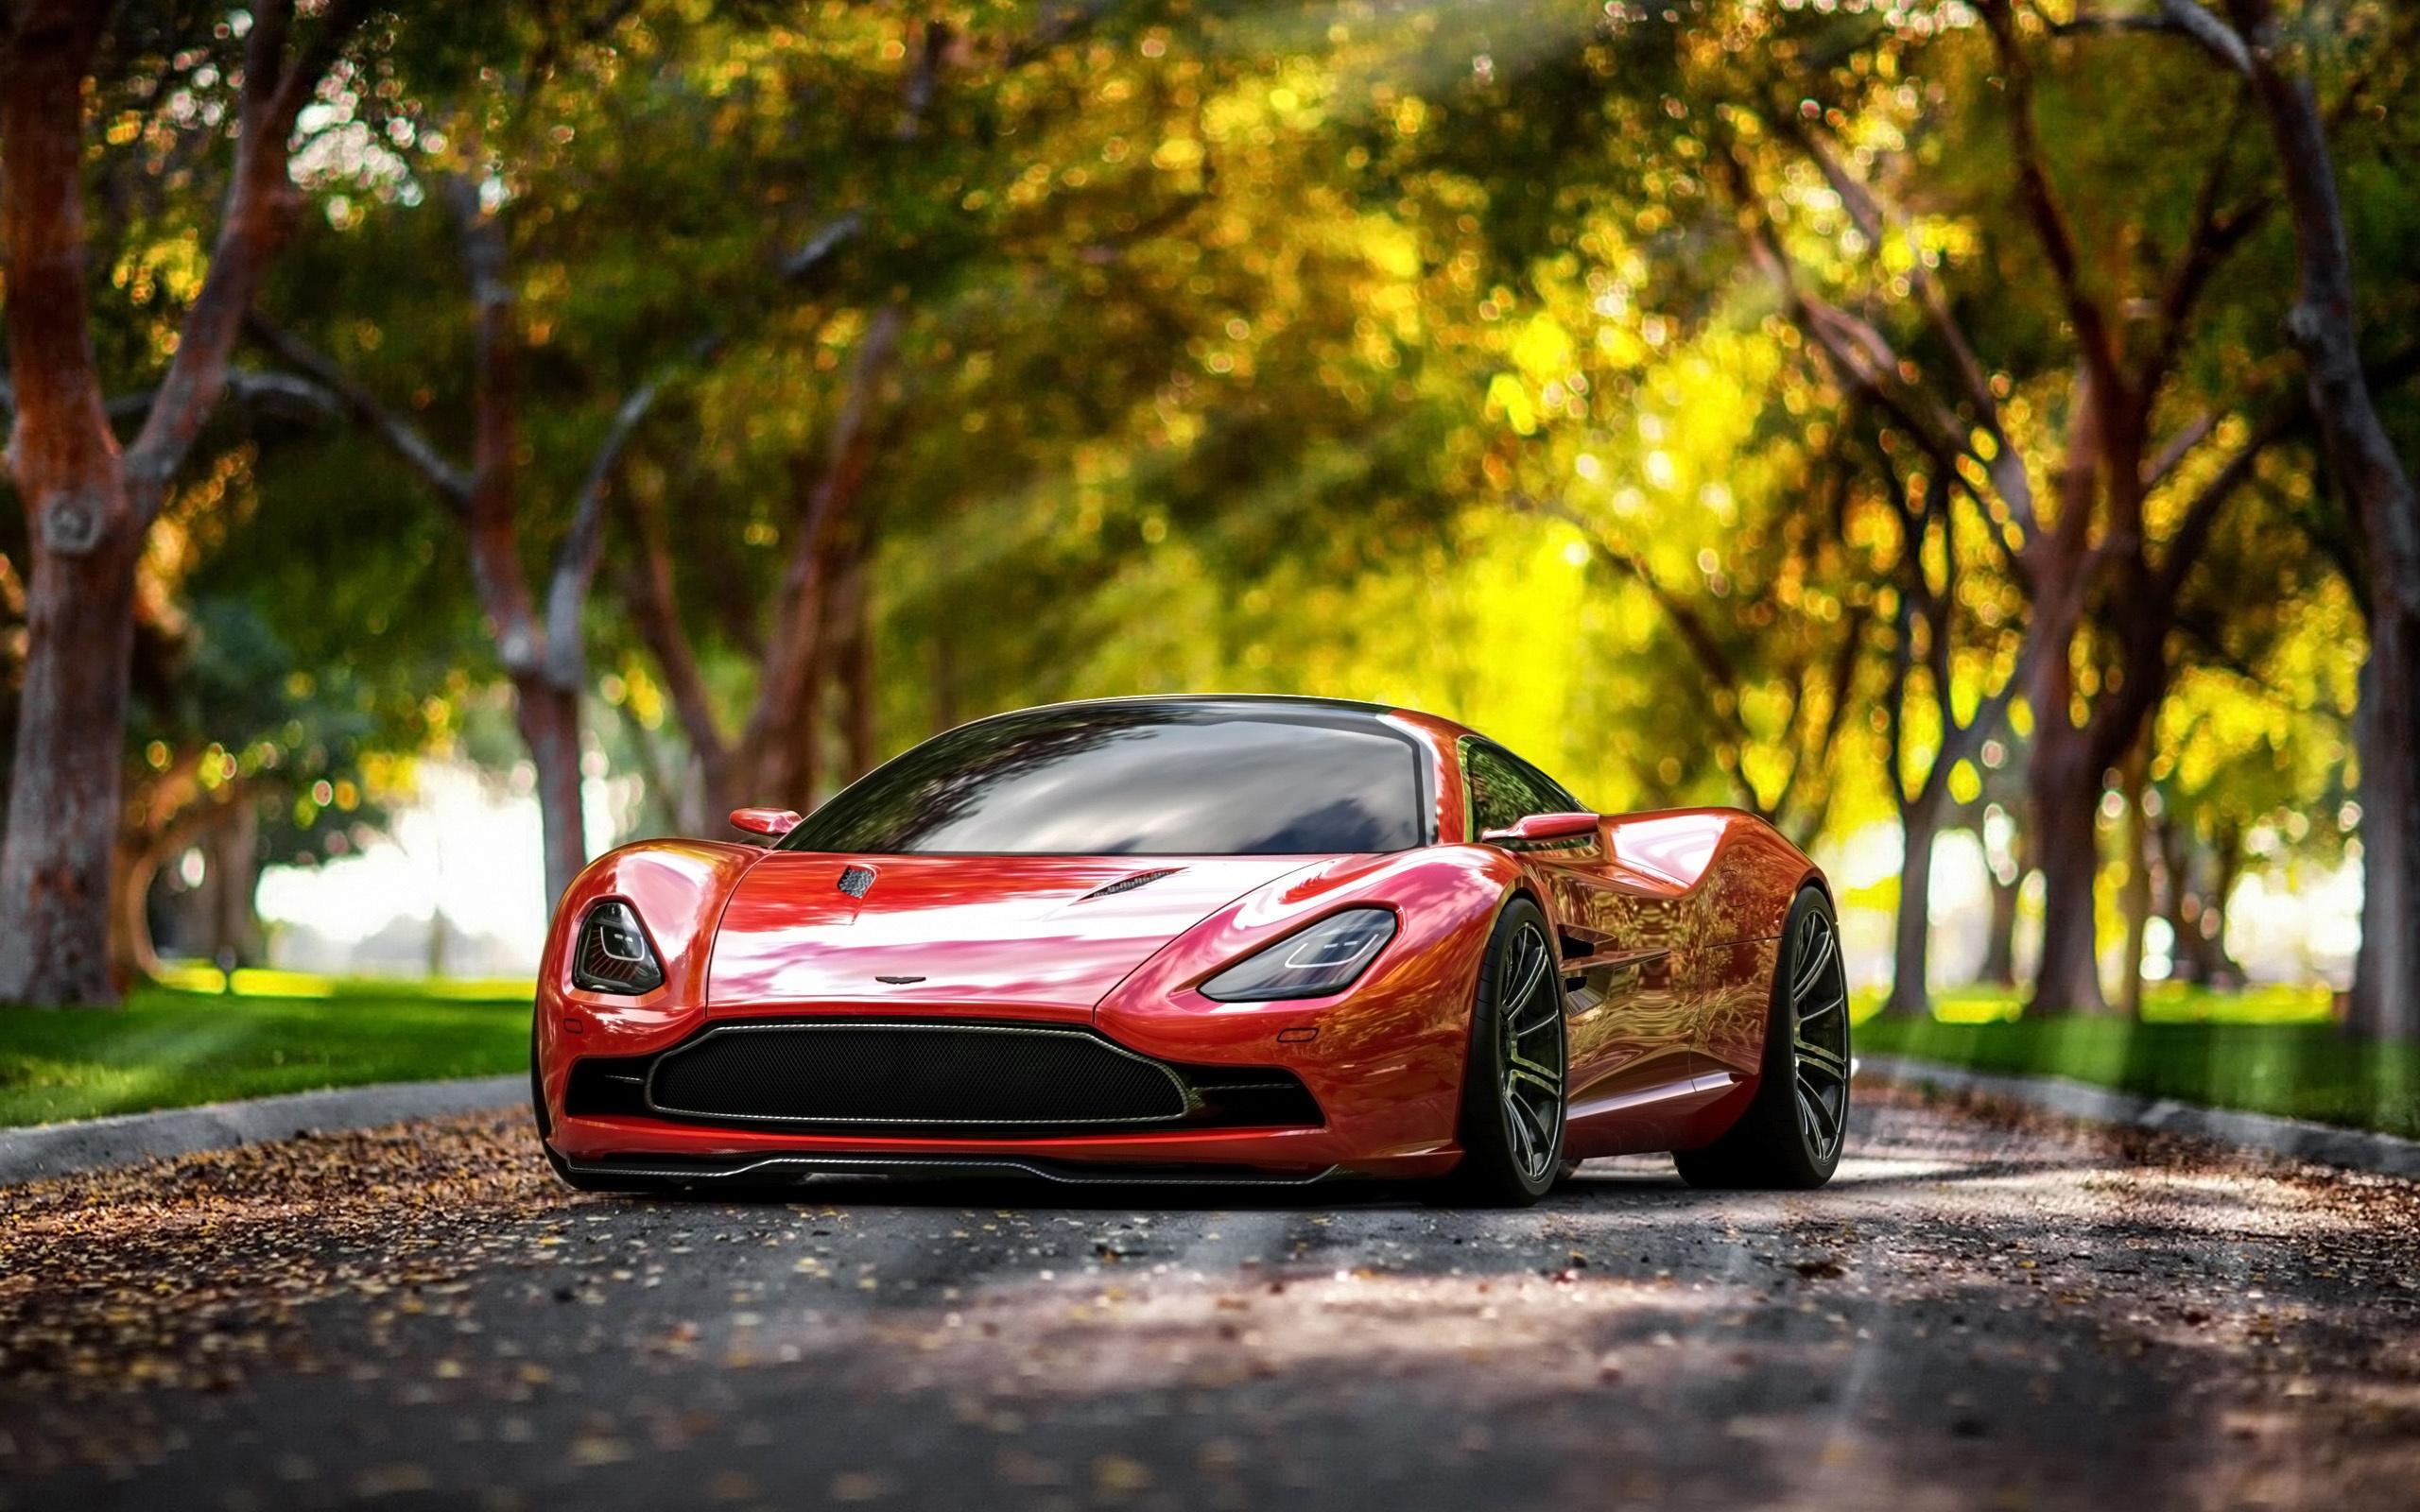 car wallpaper,land vehicle,vehicle,car,supercar,sports car